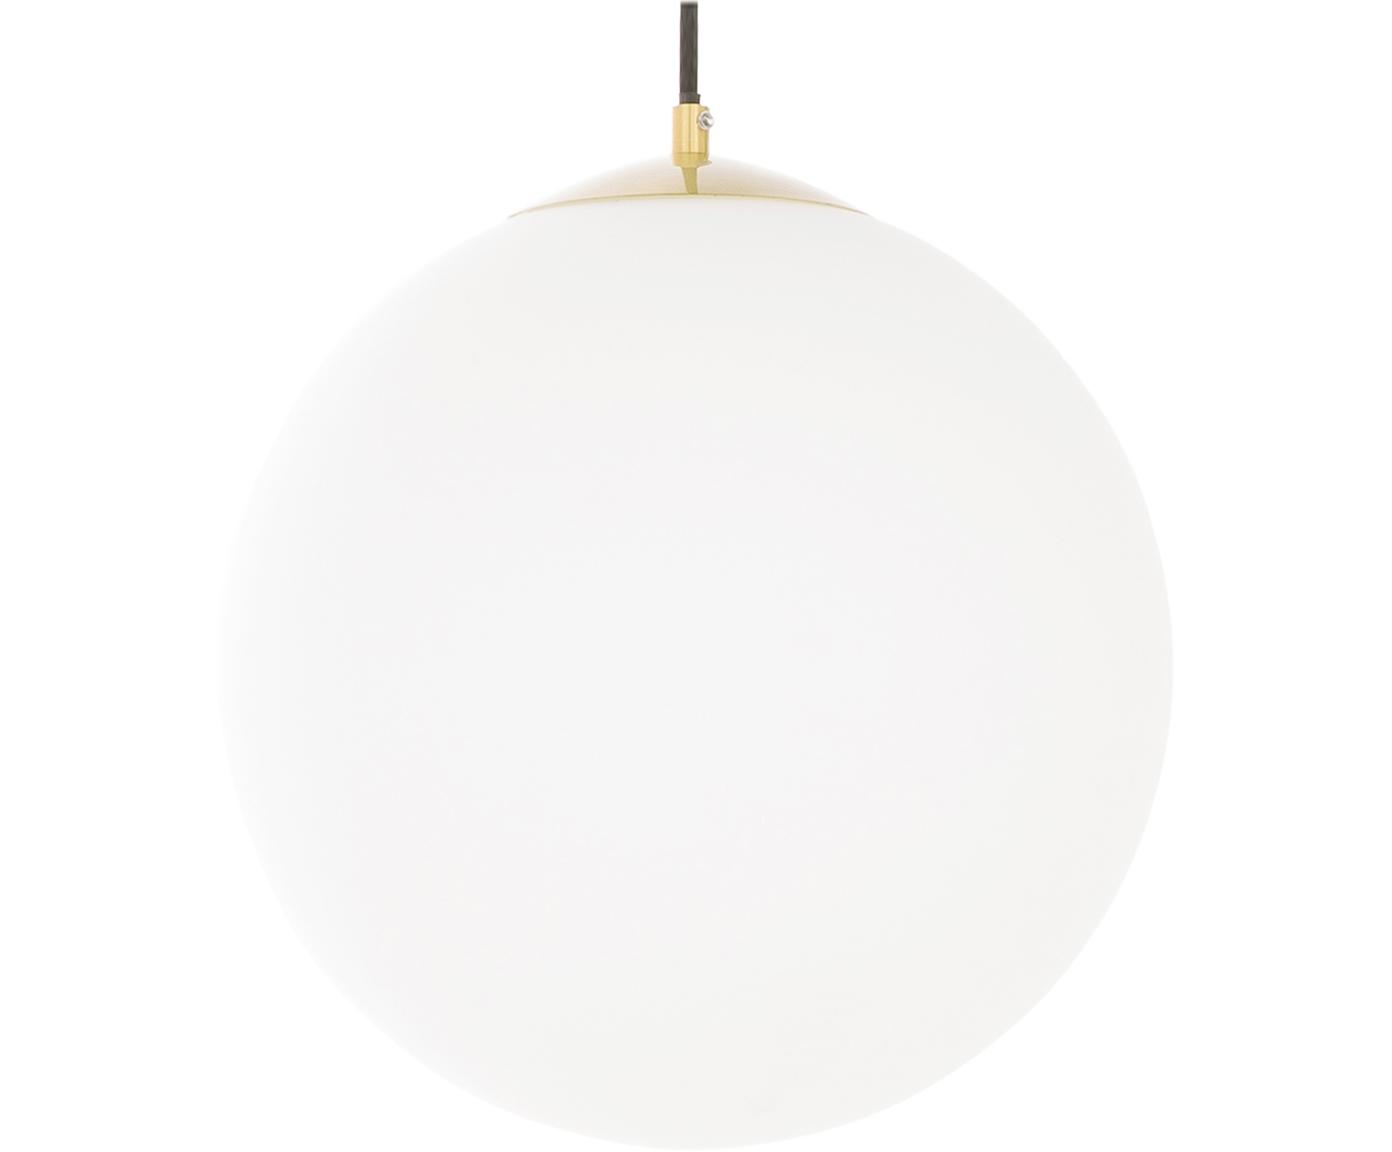 Kugel-Pendelleuchte Beth aus Opalglas, Lampenschirm: Opalglas, Weiß, Messing, Ø 30 cm